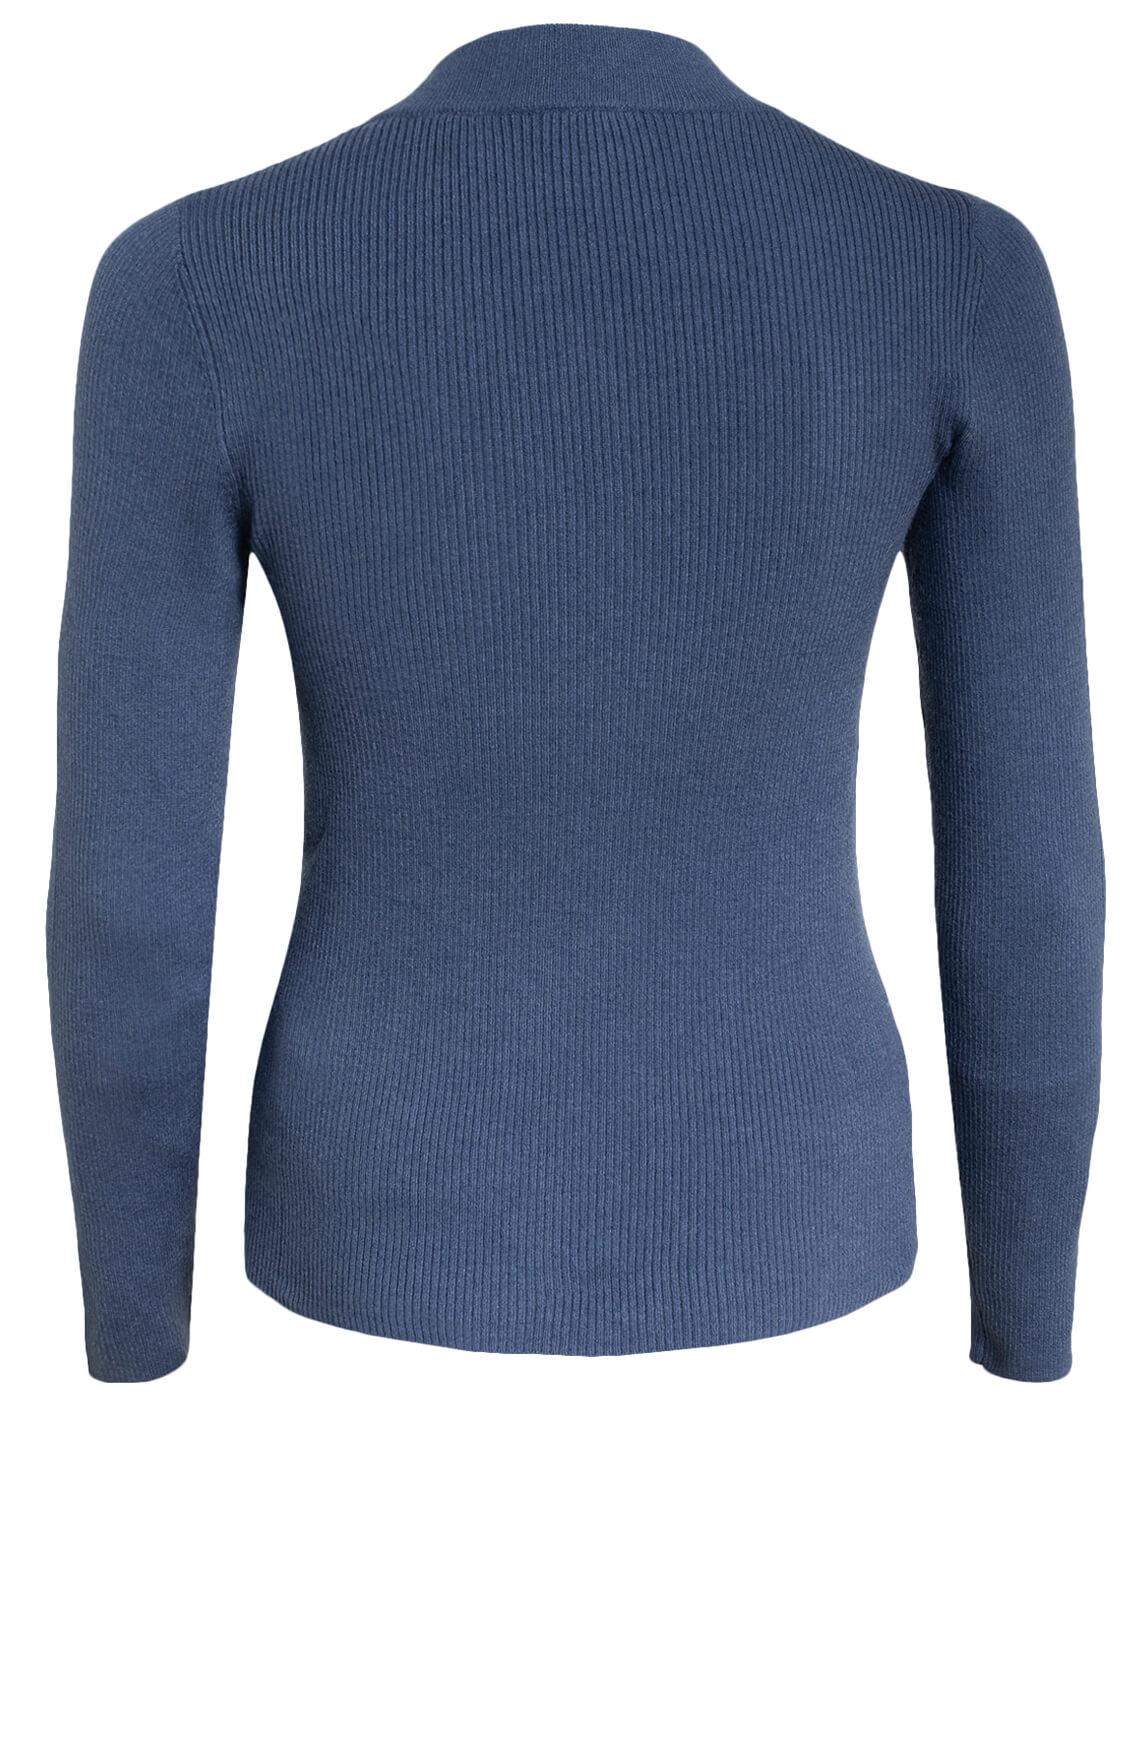 Levi s Dames Stretch pullover Blauw